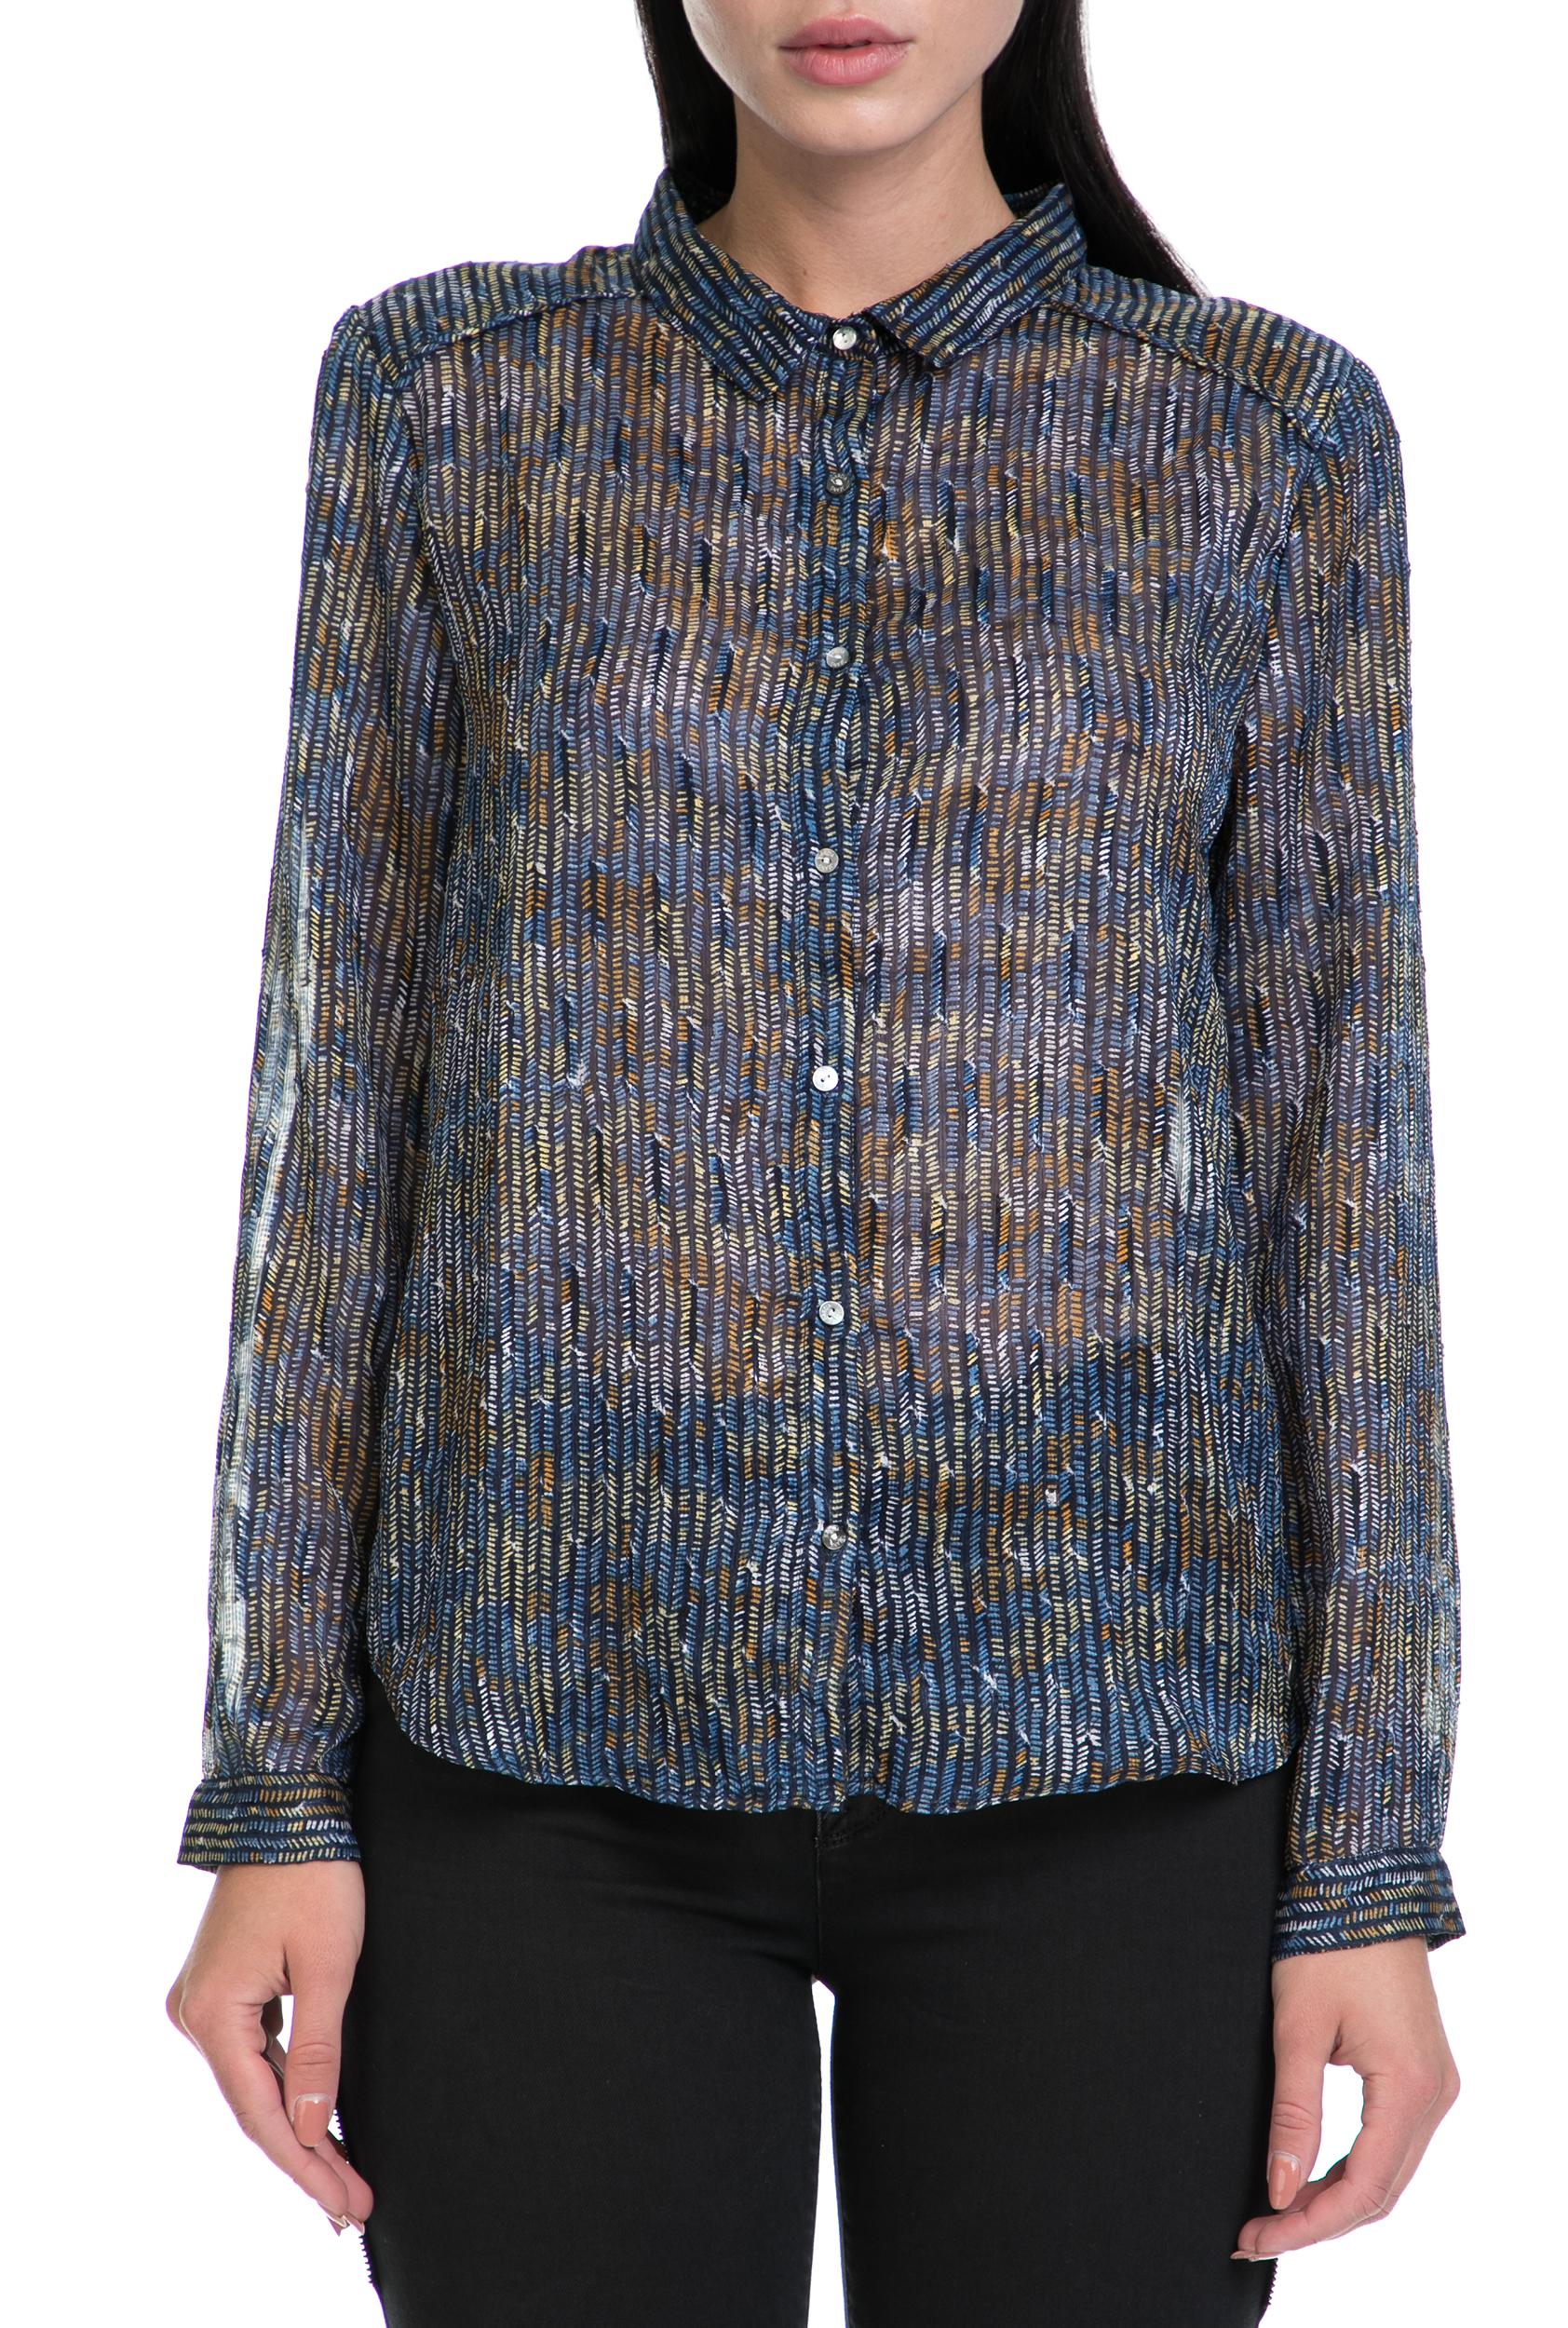 3467e99dab59 GARCIA JEANS - Γυναικείο πουκάμισο GARCIA JEANS μπλε-καφέ